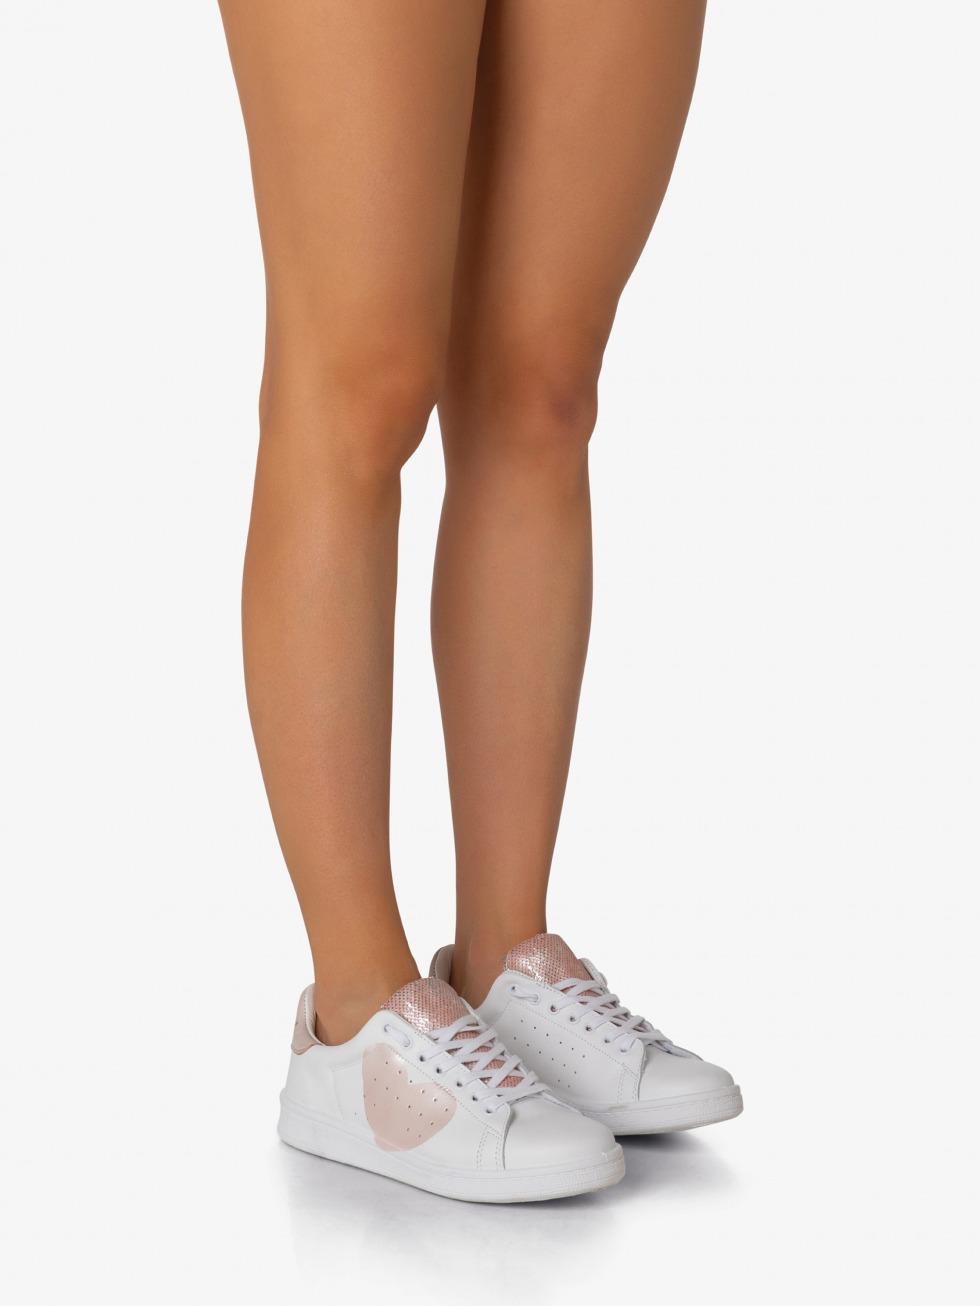 Daiquiri Sneakers - Sparkle Taffy Heart